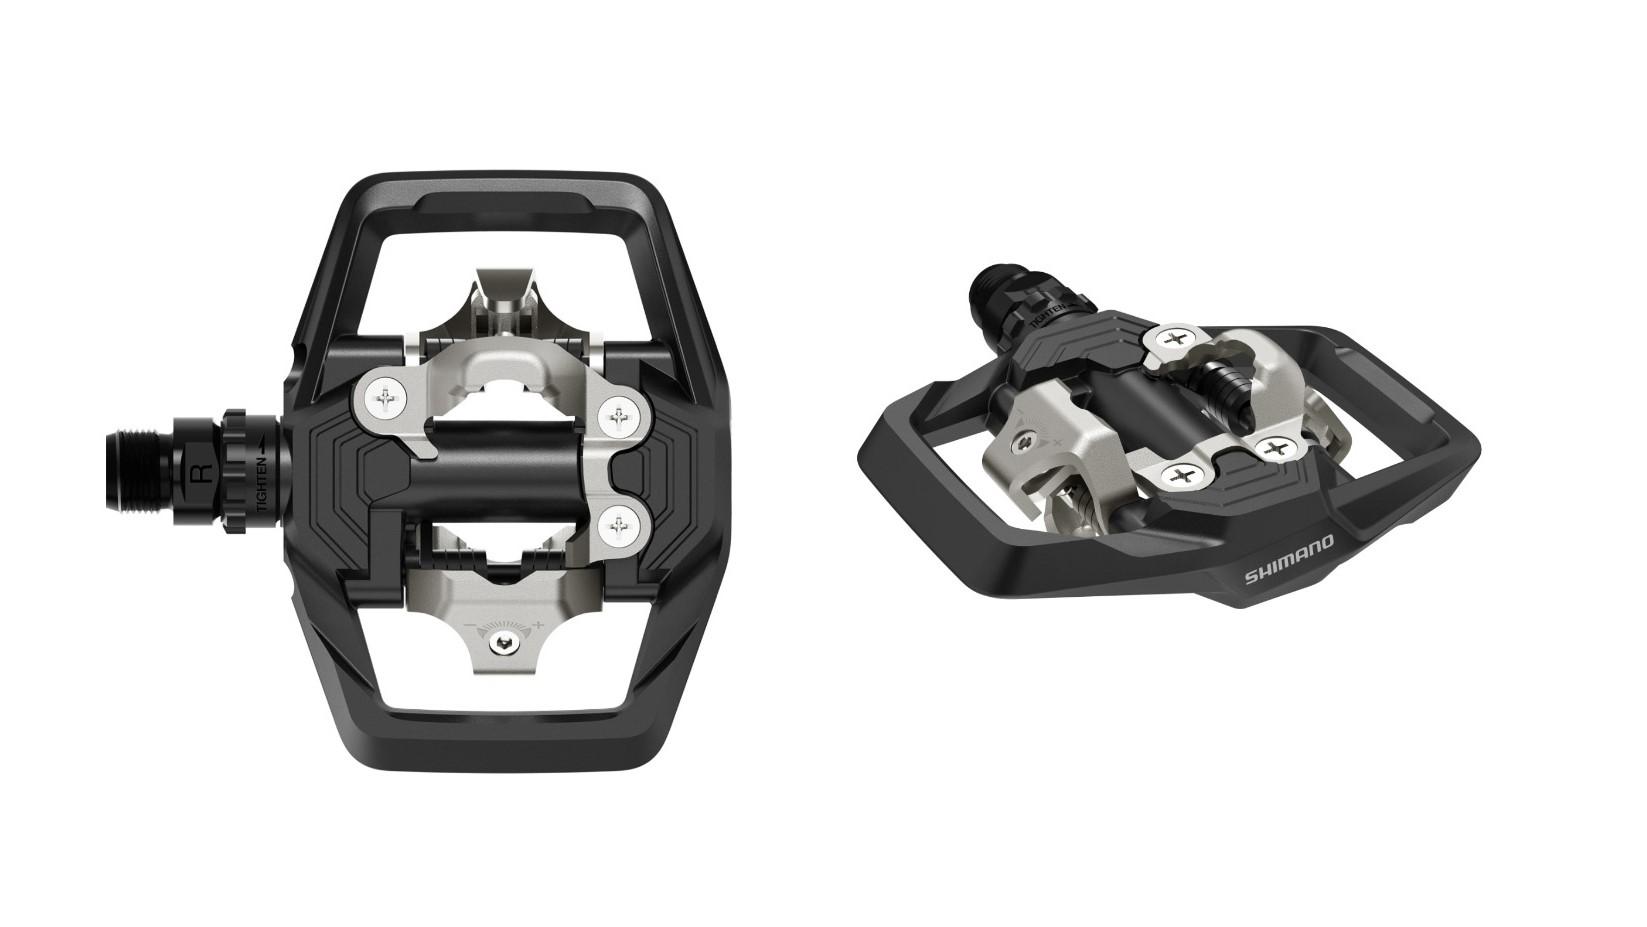 Shimano PD-ME700 pedal replaces M530